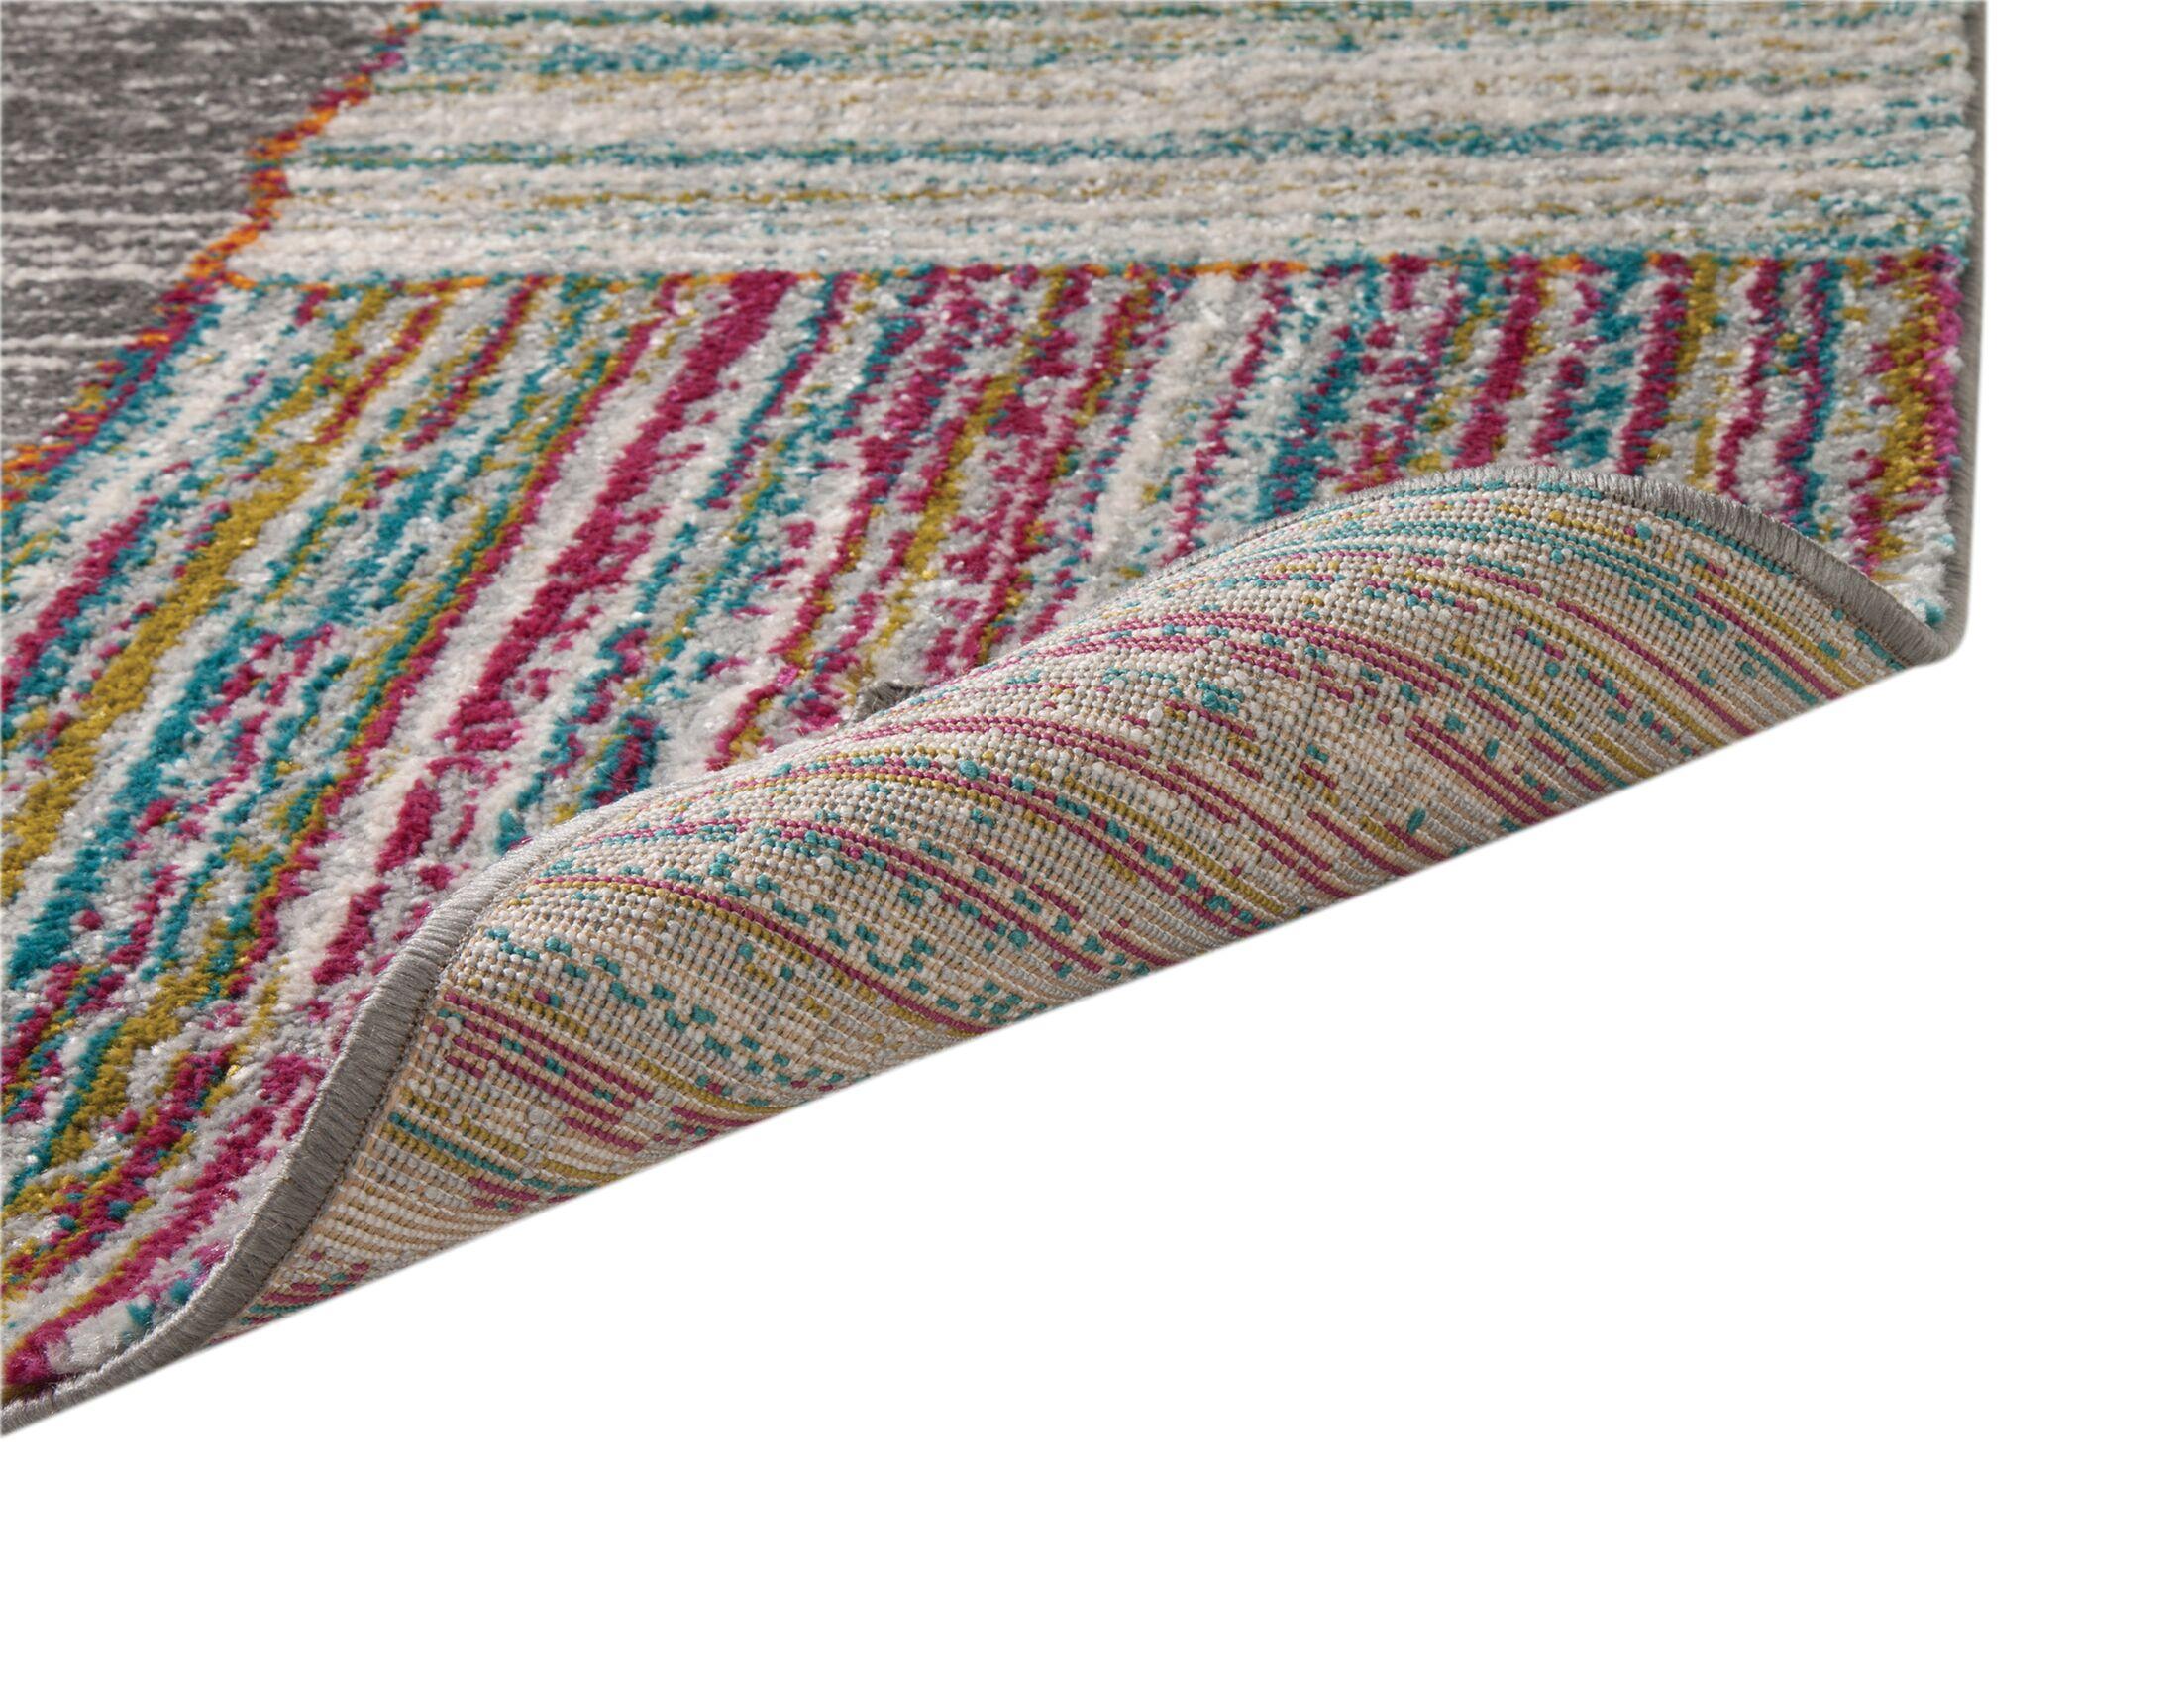 Shurtz Gray/Pink/Blue Area Rug Rug Size: Rectangle 8' x 10'